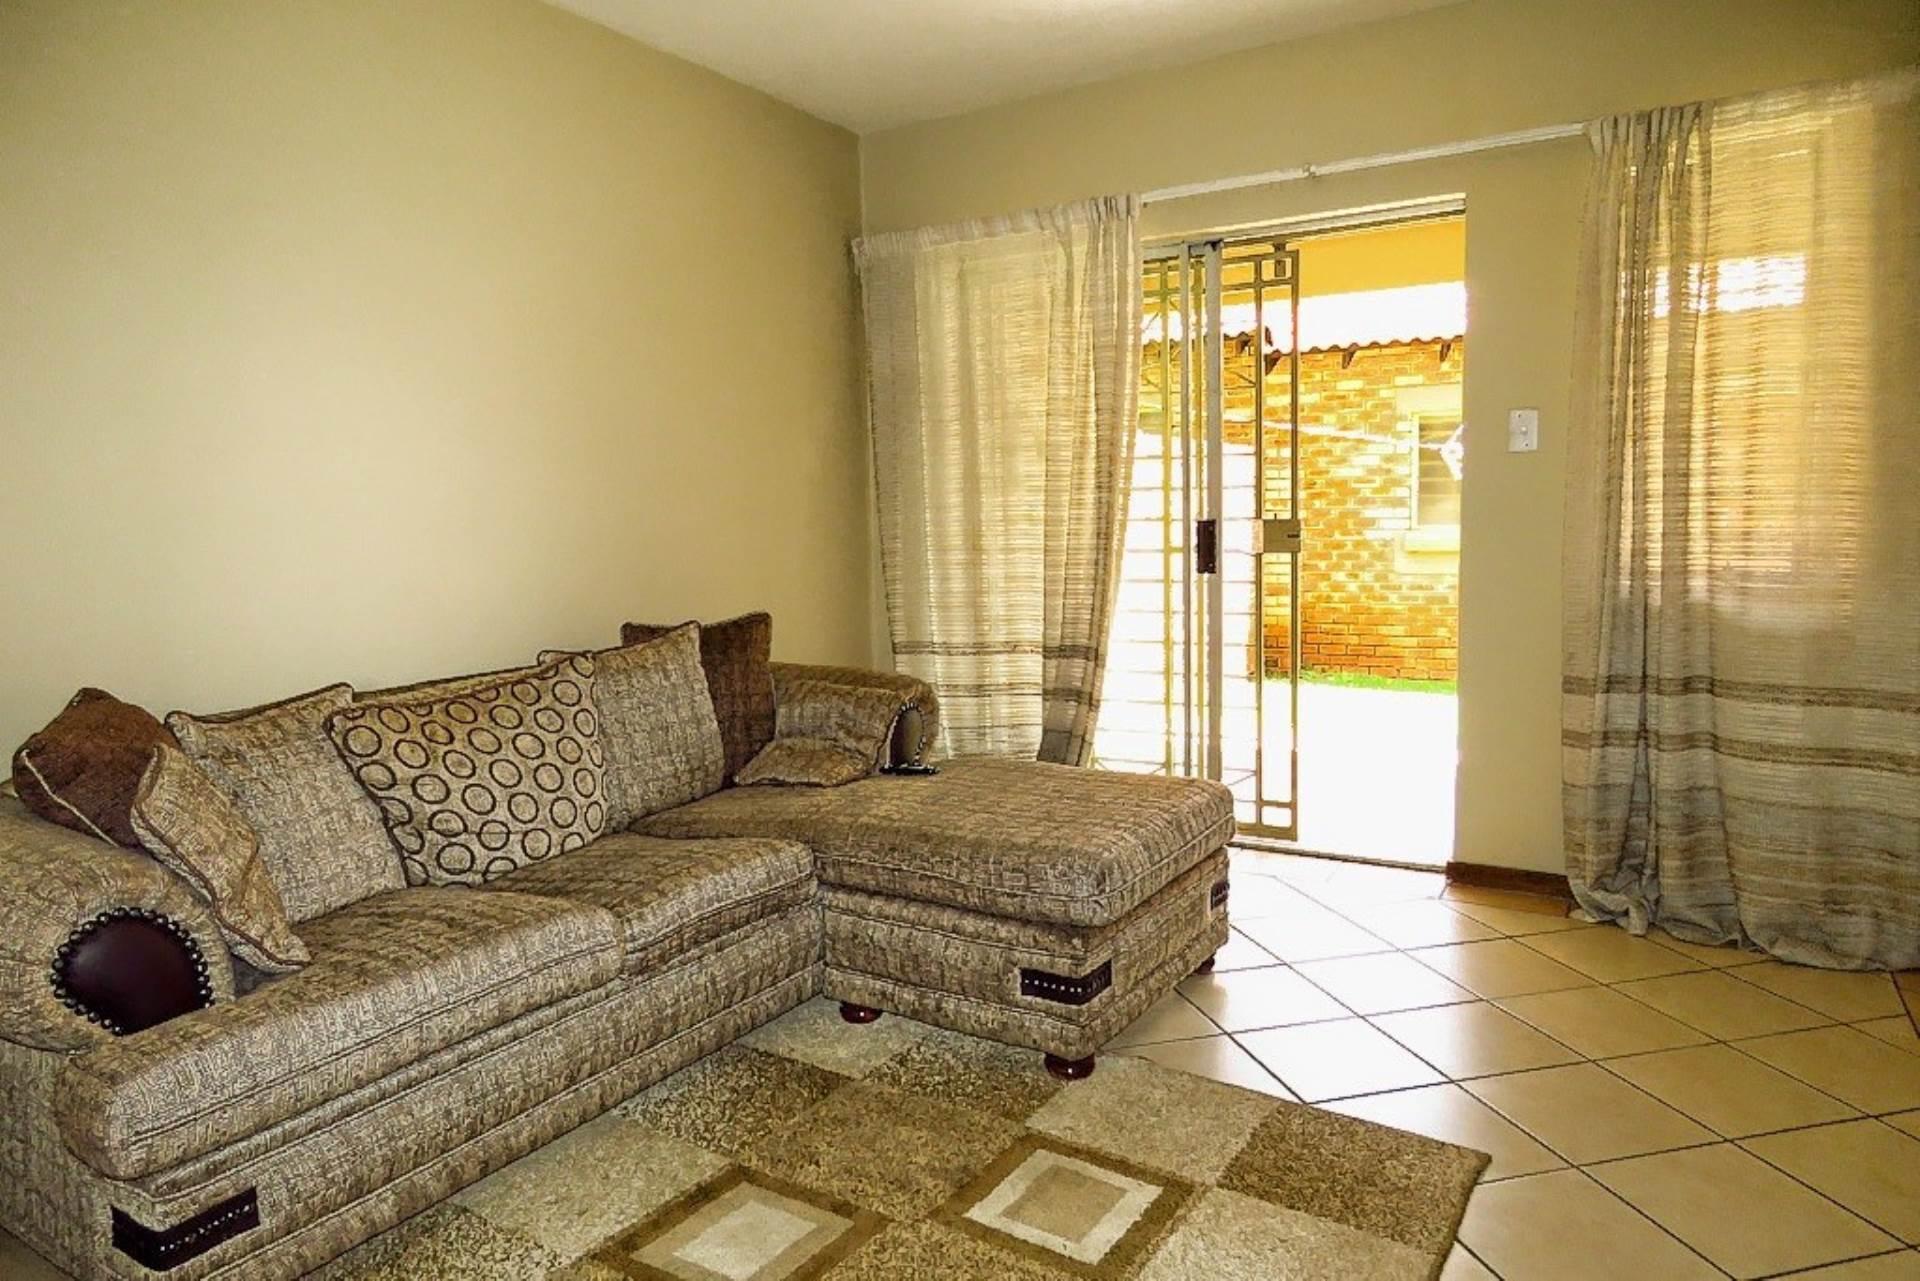 Apartment Pending Sale In Eco Park, Centurion, Gauteng for R 840,000